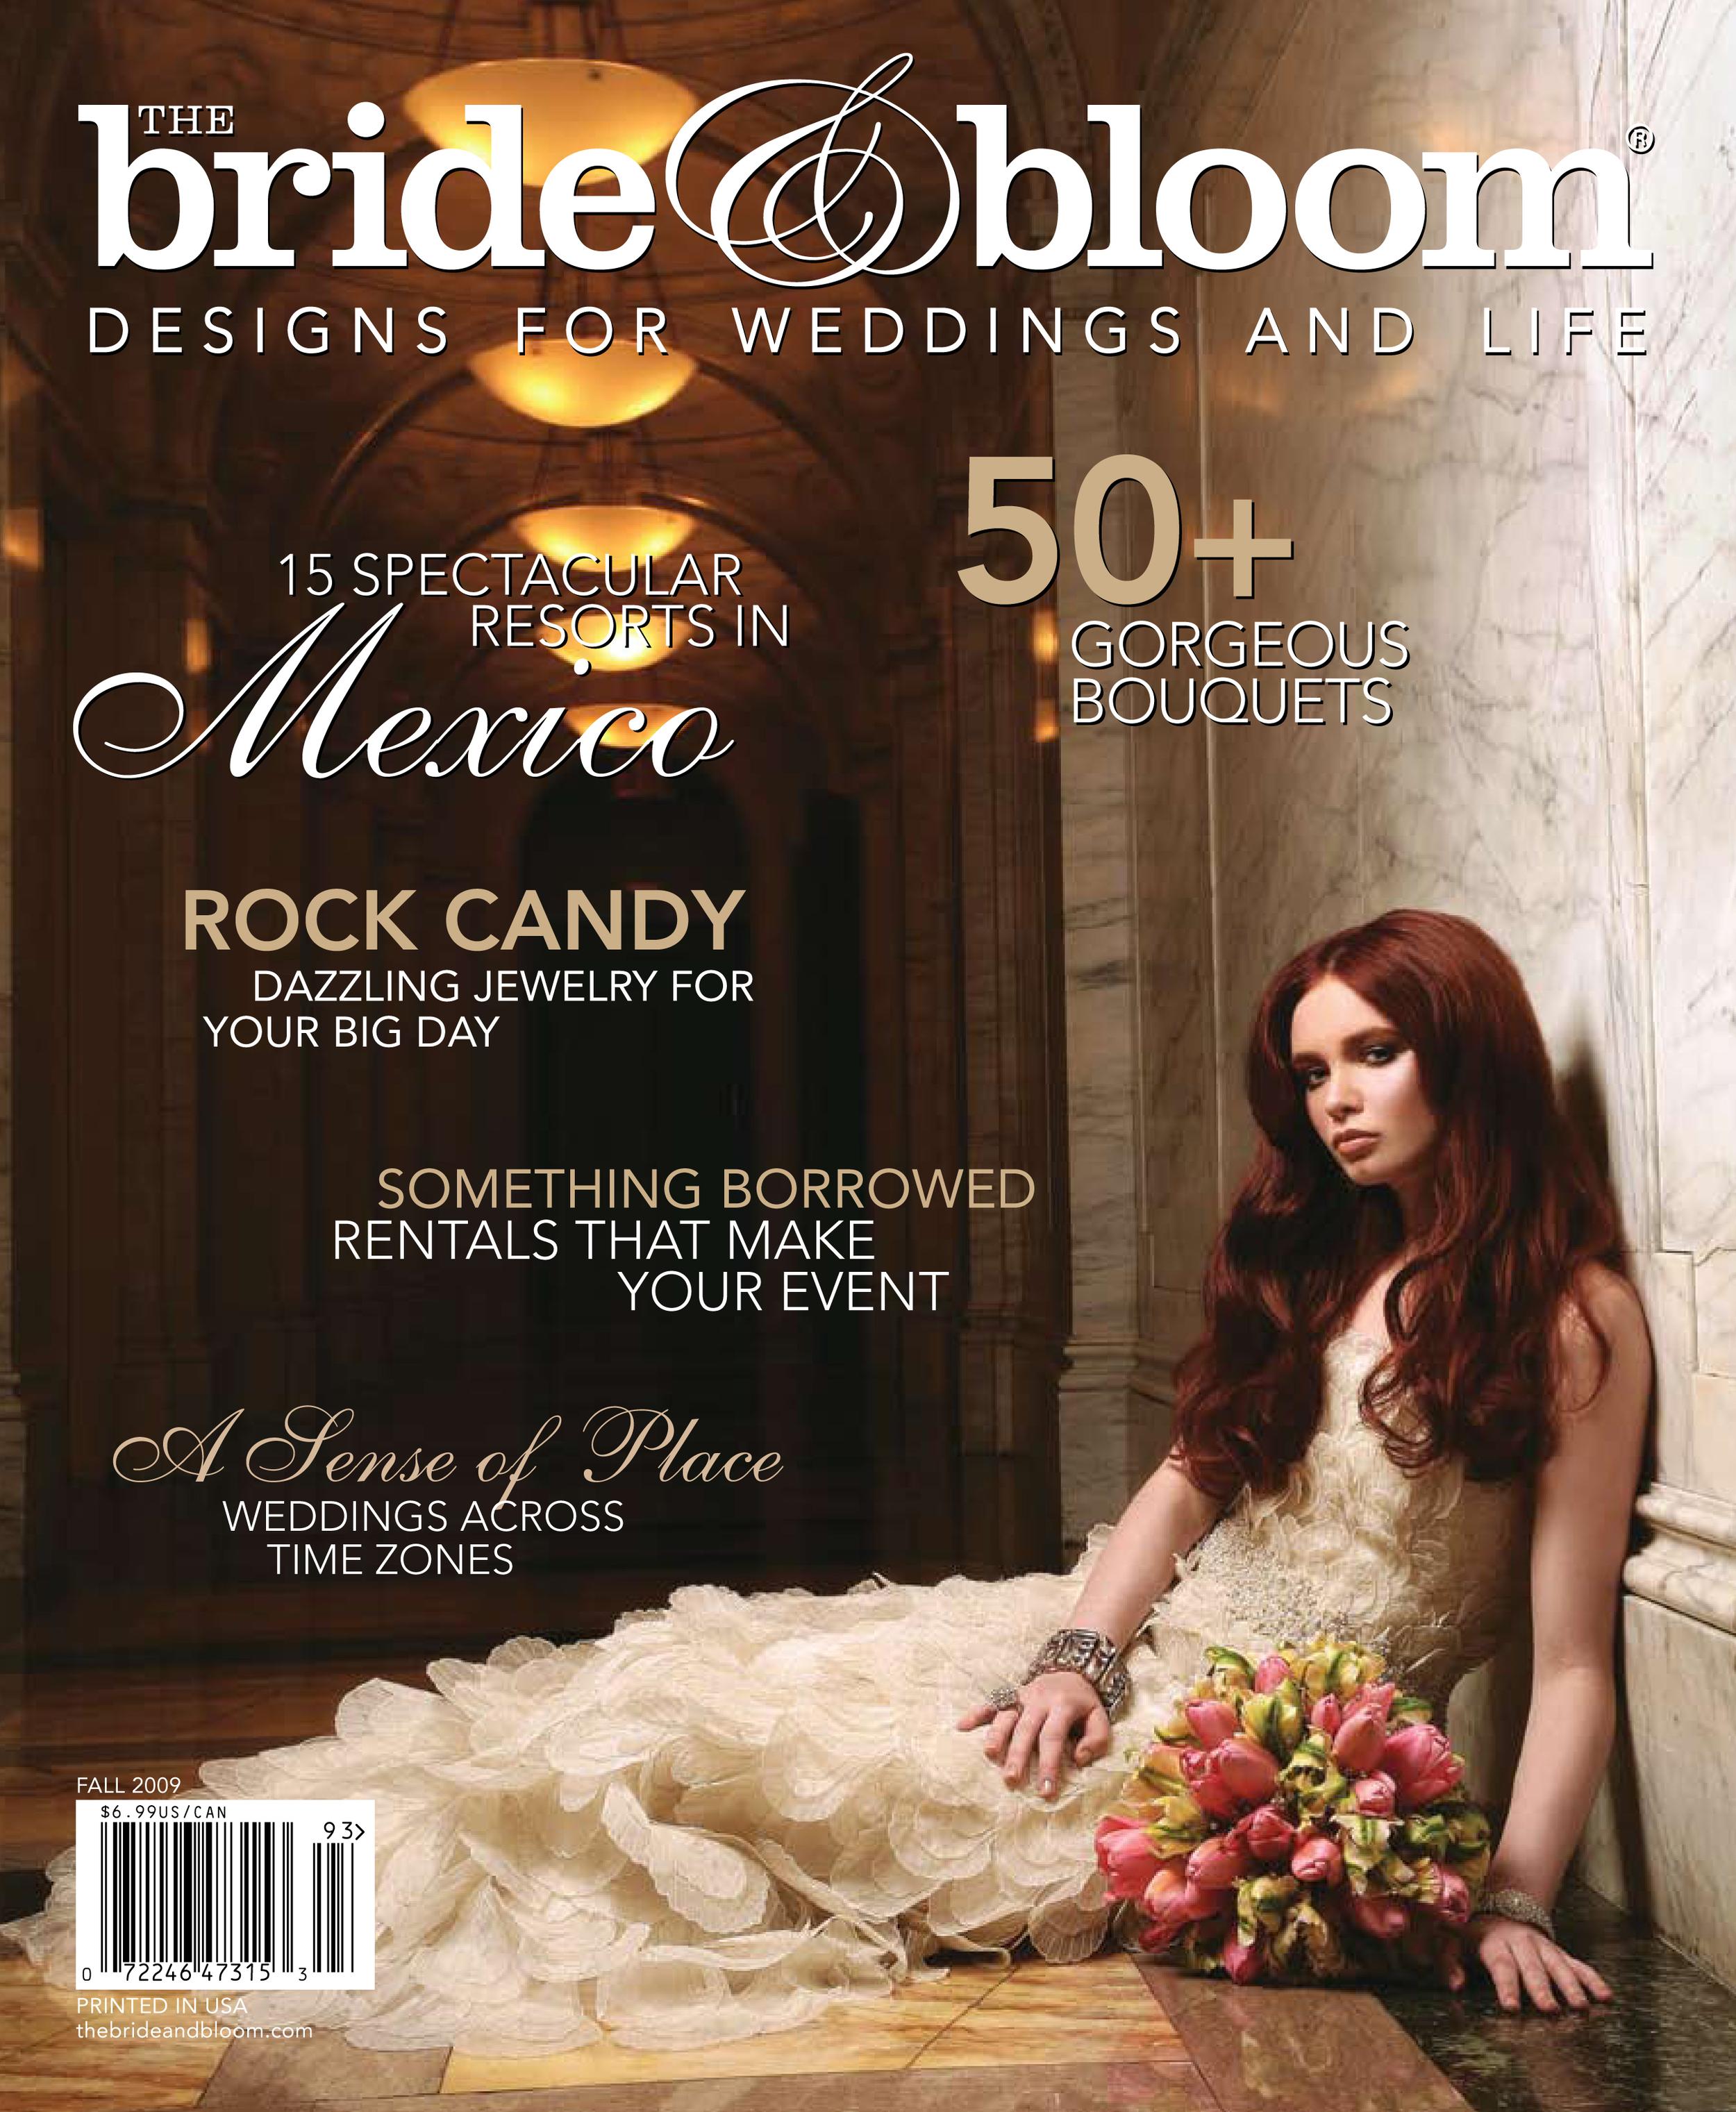 9 - B&B 2009 Cover.jpg